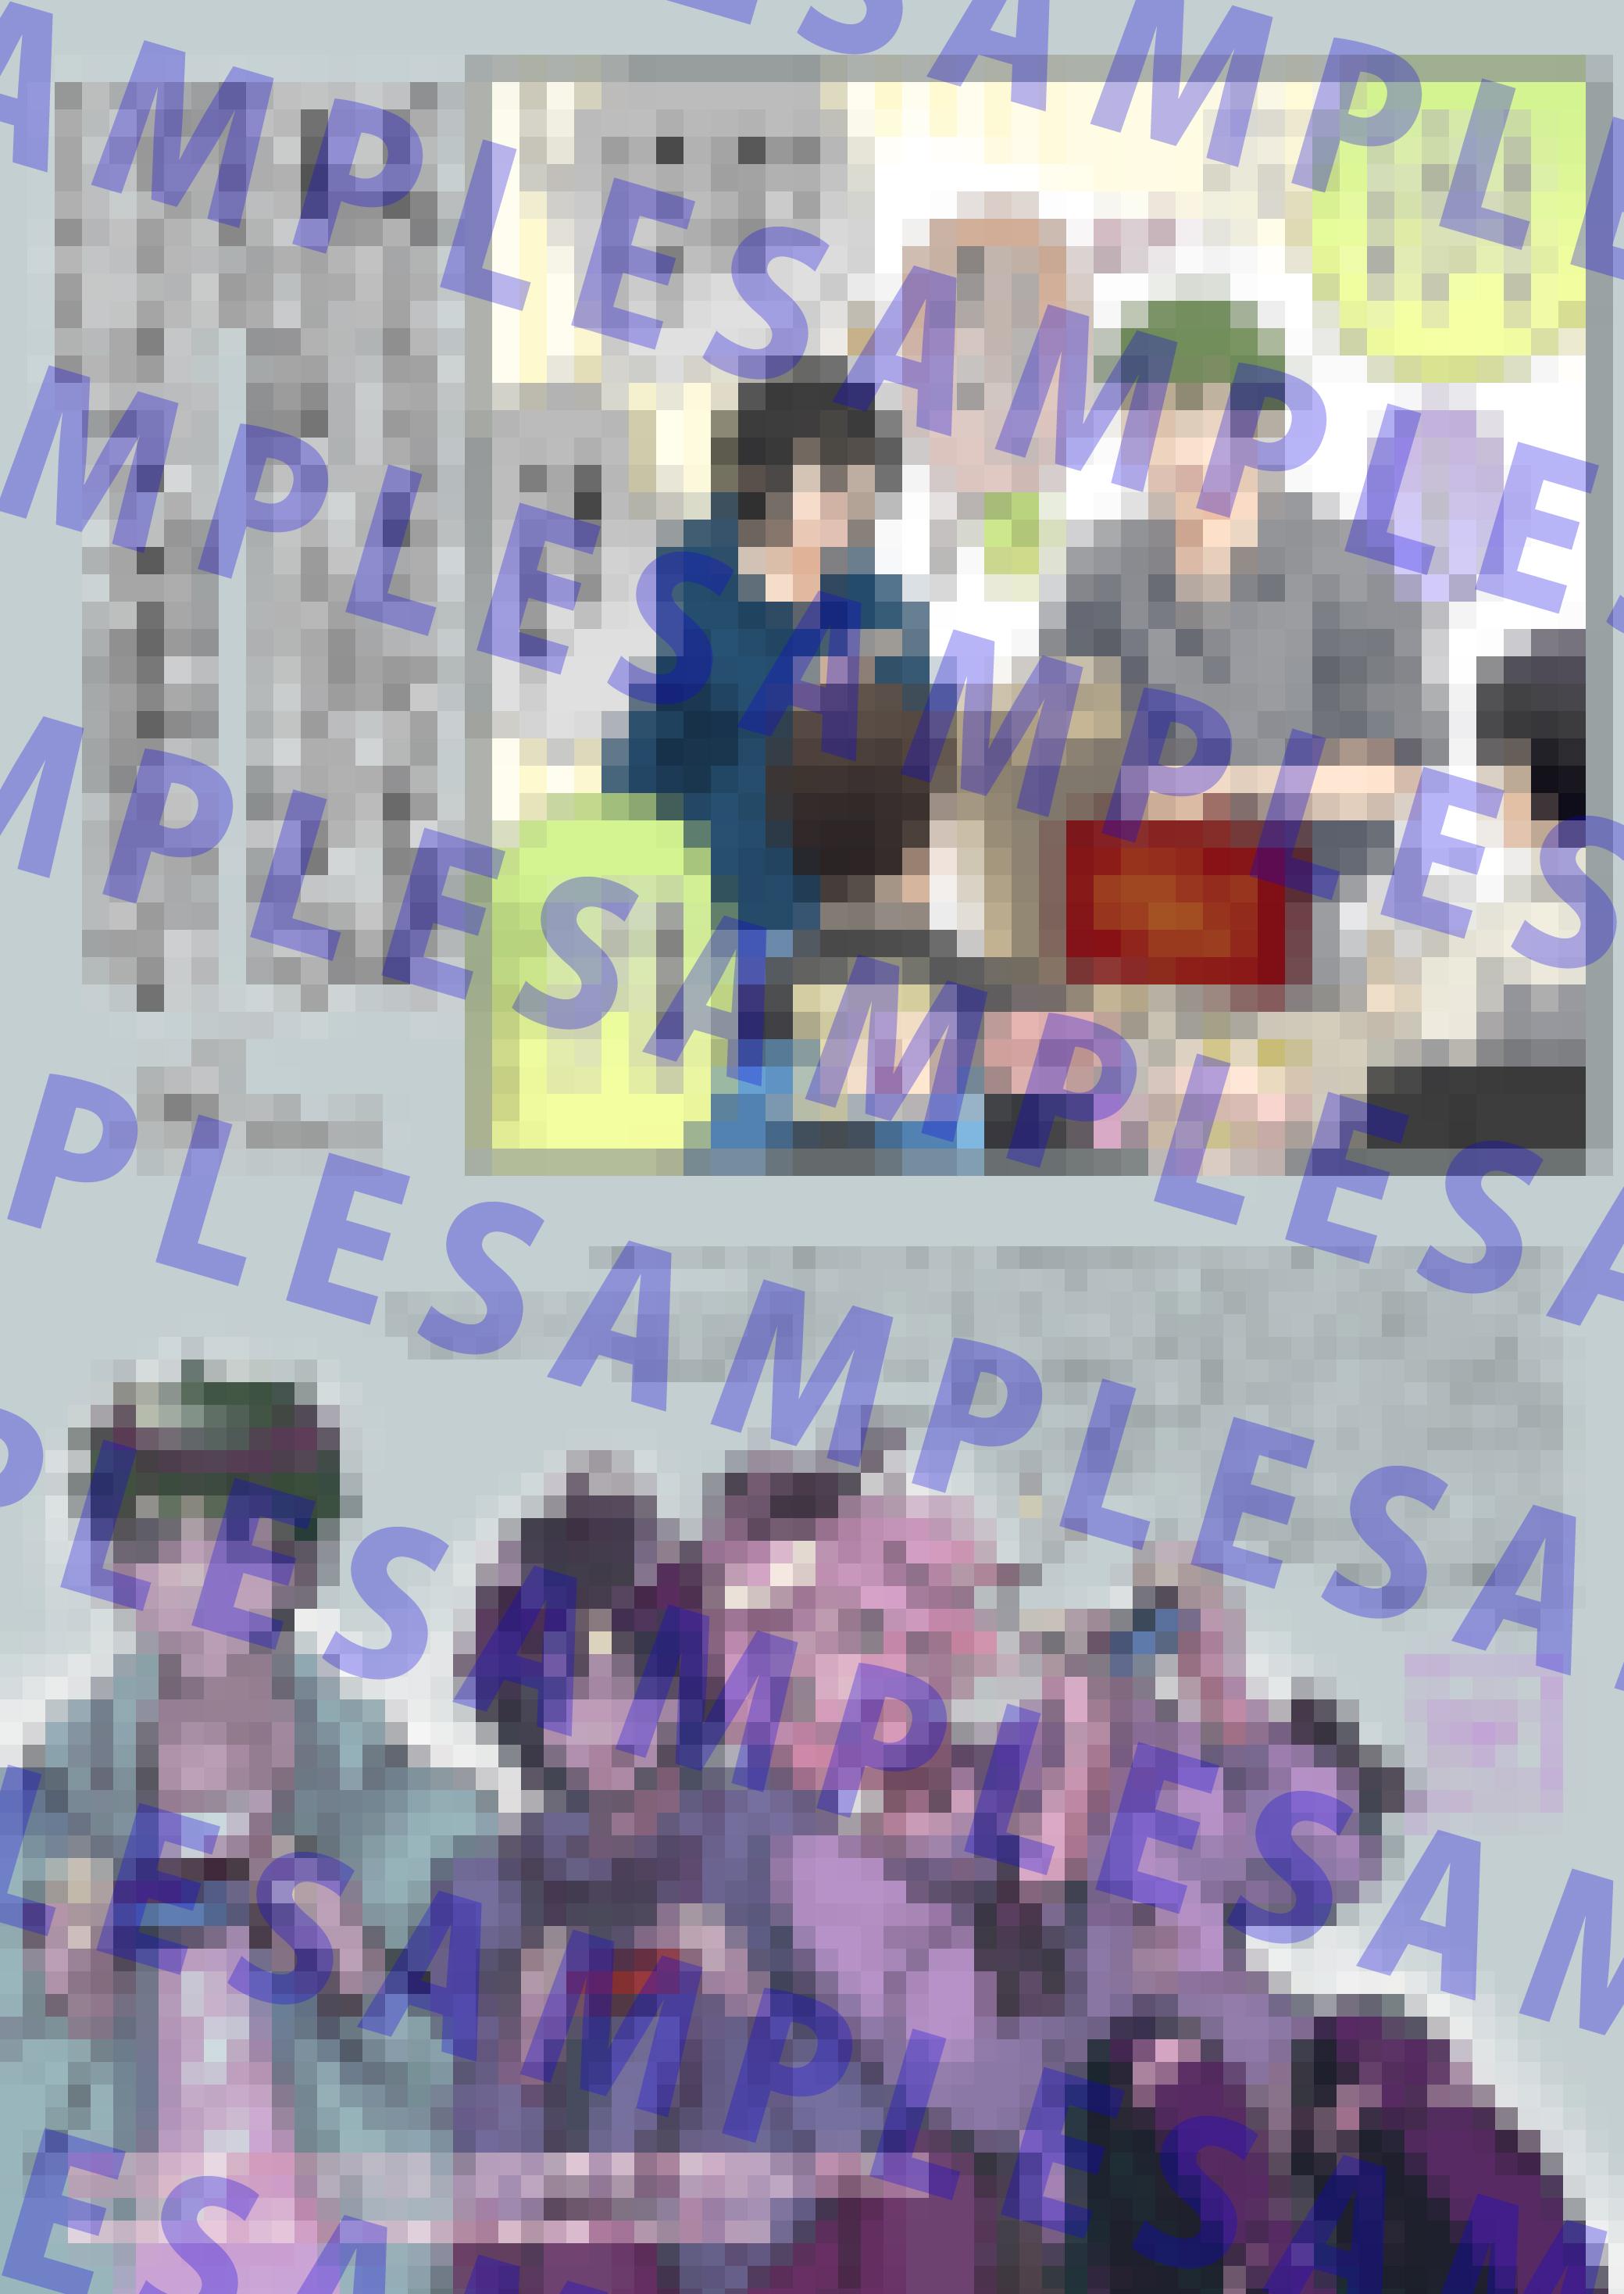 f:id:kuragebunch:20210601160529j:plain